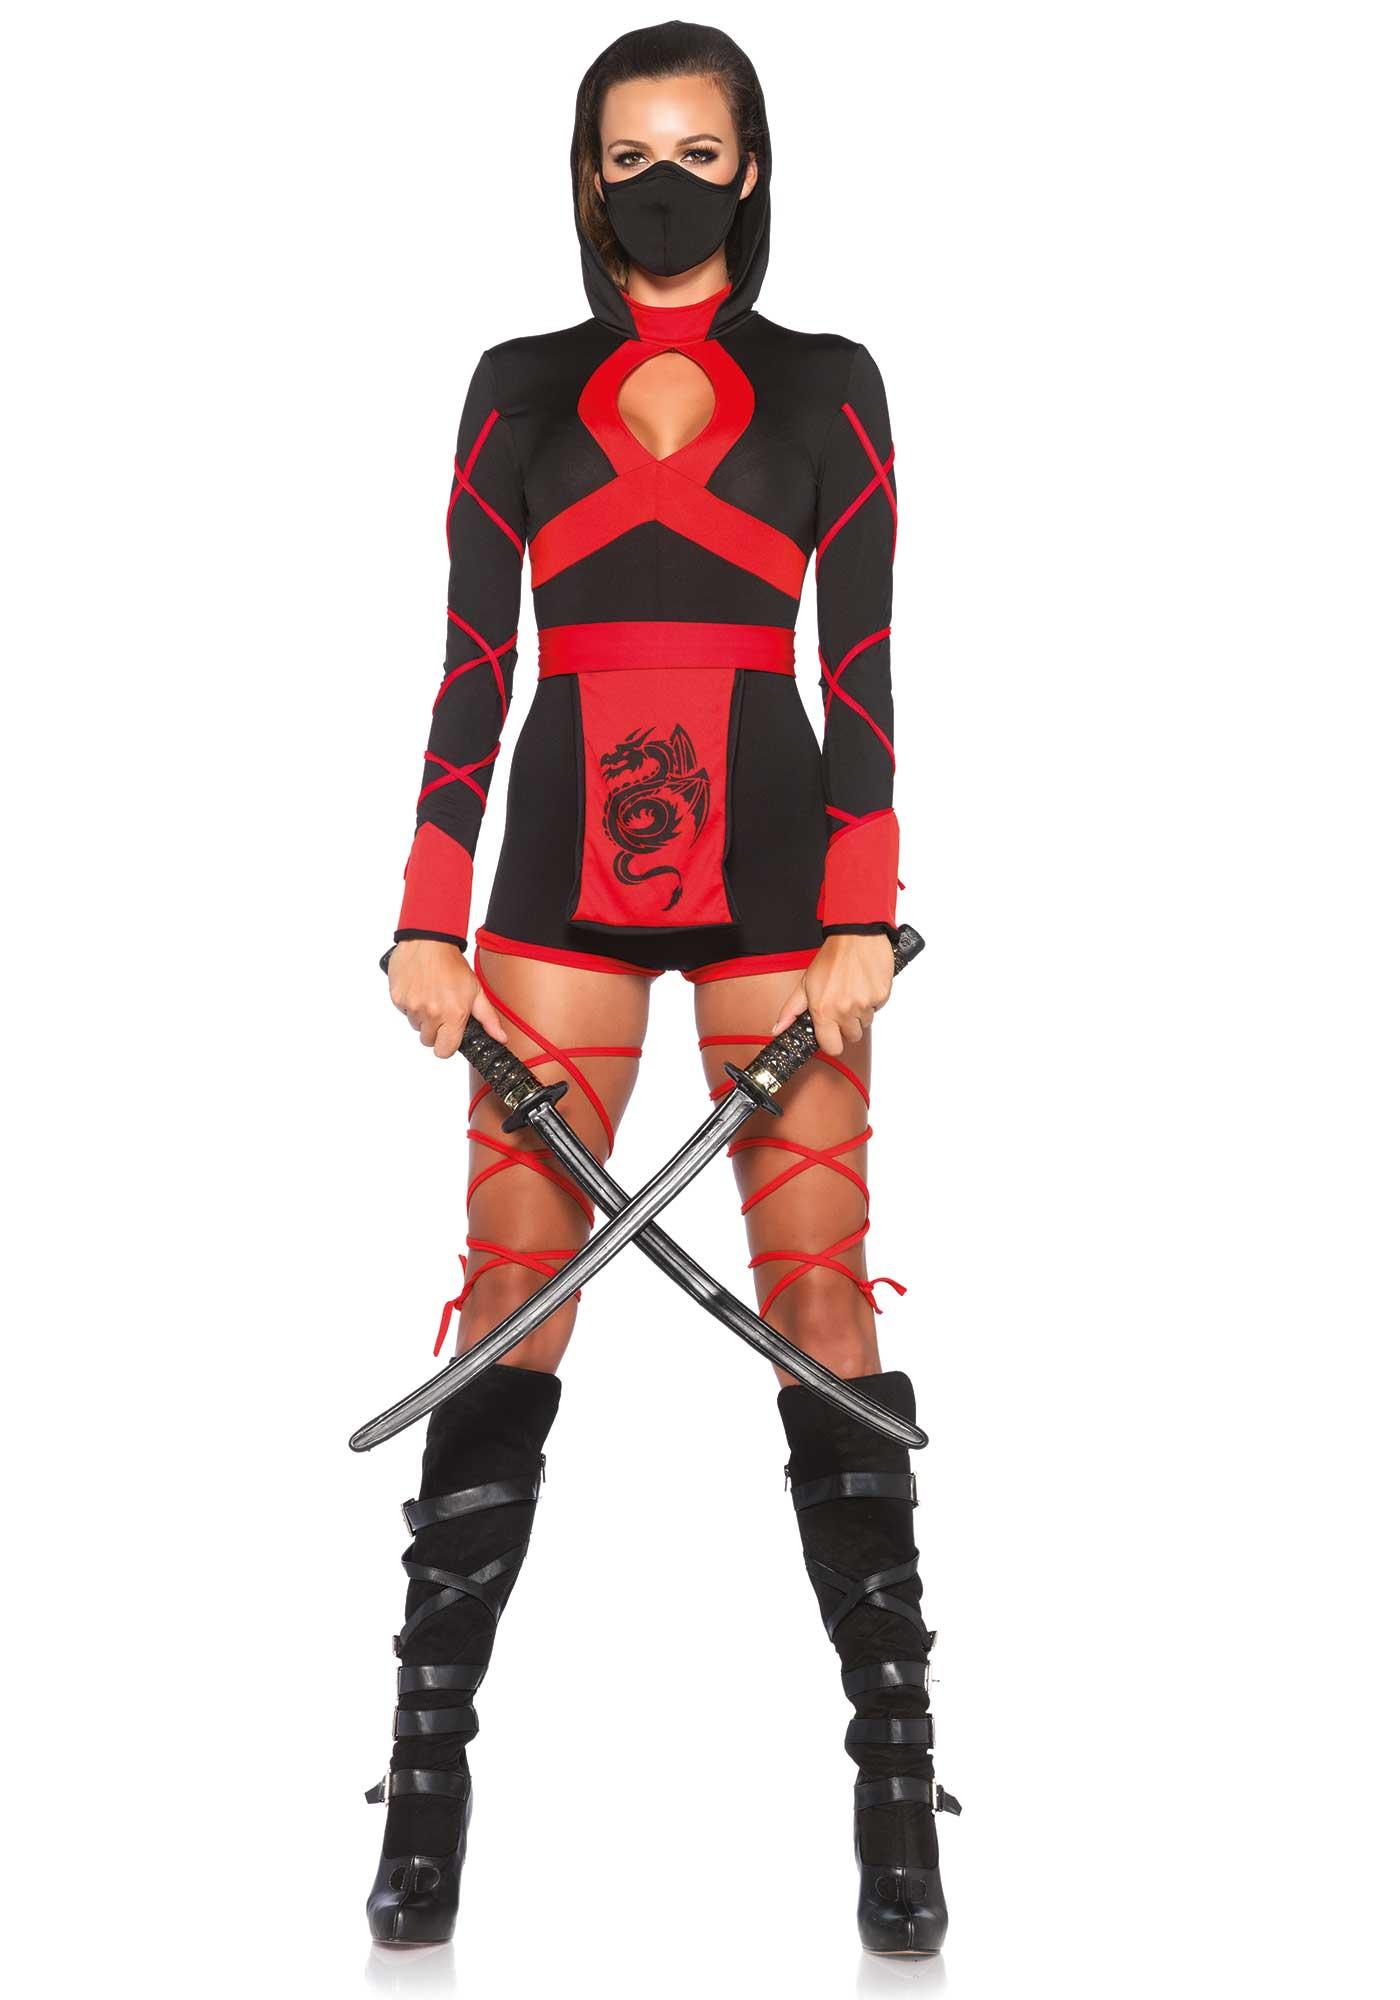 ninja kost m f r damen kost me f r erwachsene und g nstige faschingskost me vegaoo. Black Bedroom Furniture Sets. Home Design Ideas